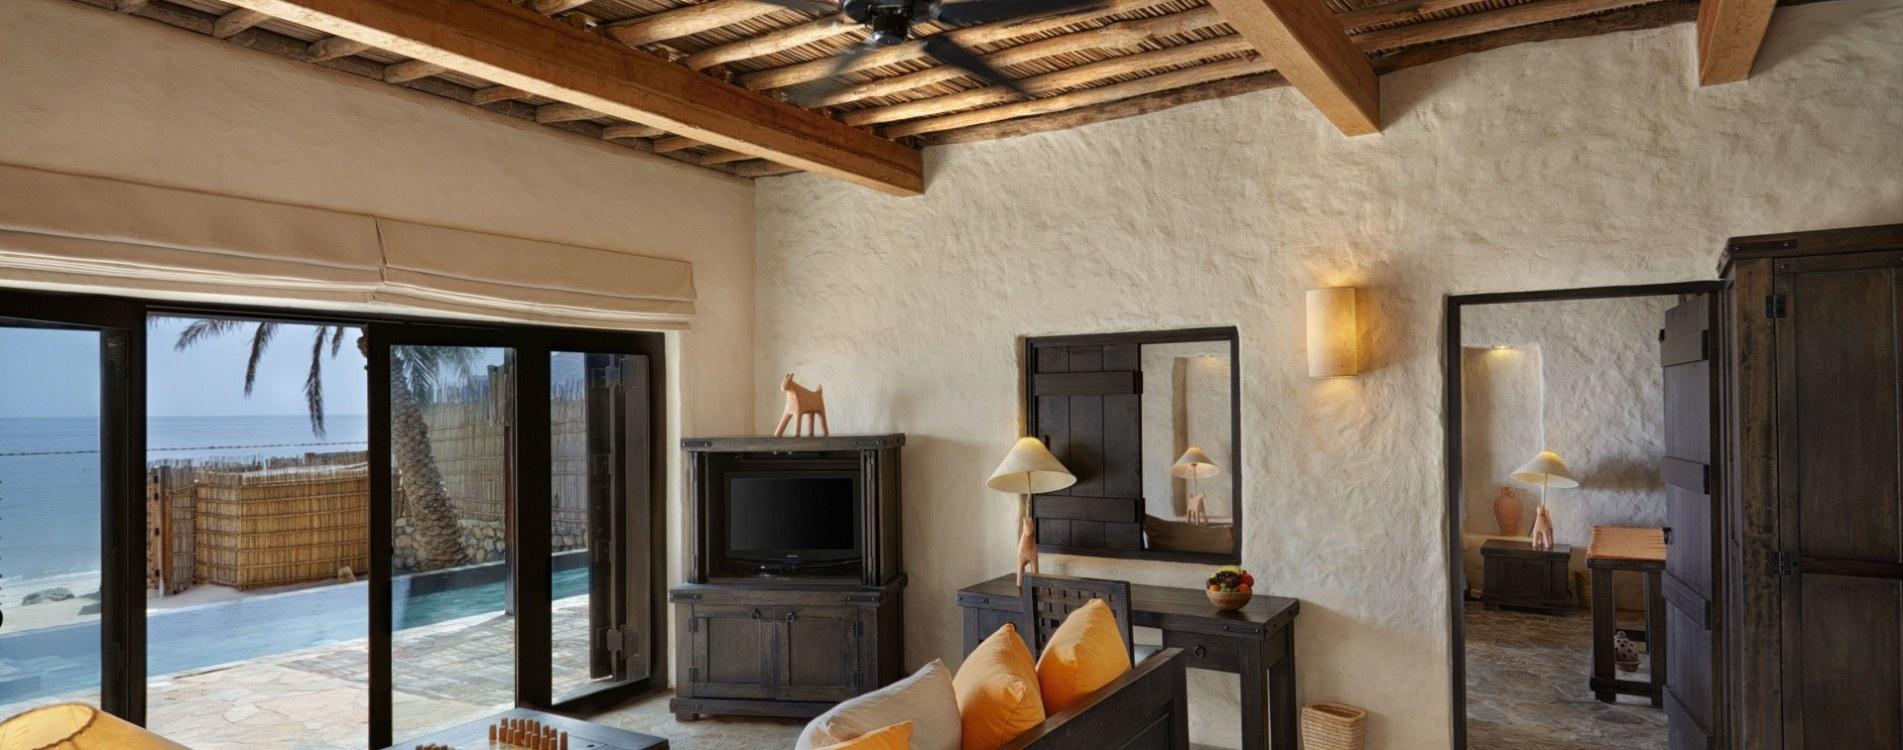 Six-Senses-Zighy-Bay-Pool-Villa-Suite-Beachfront-Wohnzimmer-Oman.jpg